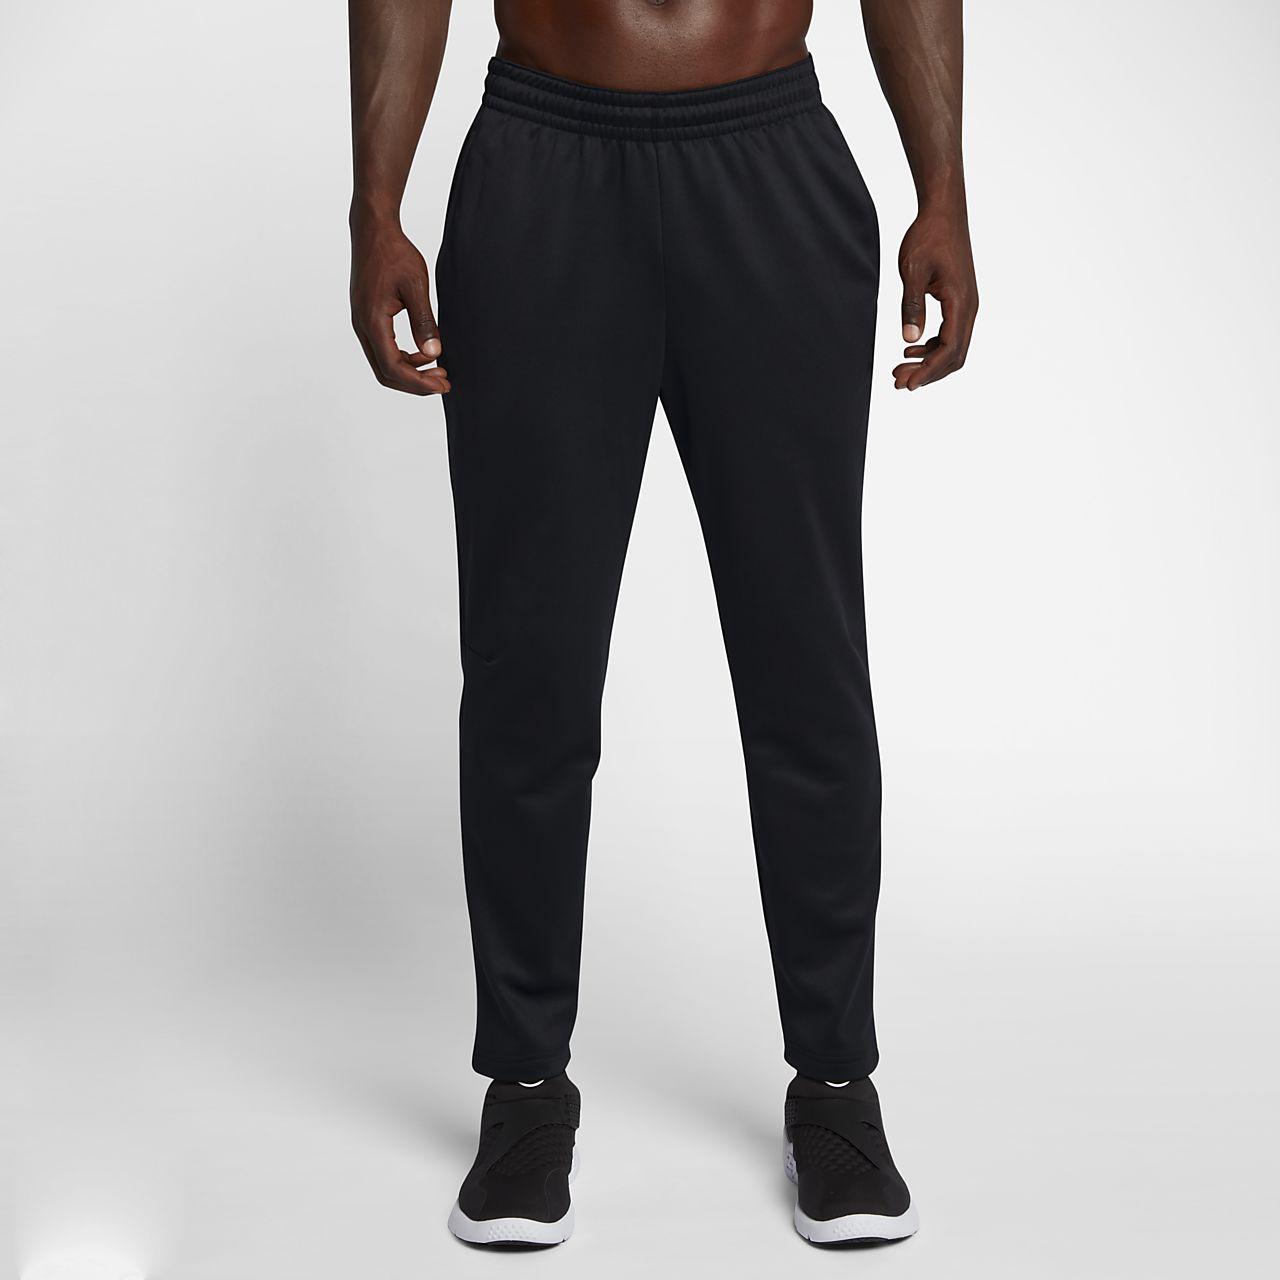 Ca Jordan Alpha De Pour Pantalon Homme 23 Therma Training 7nAxq8U4